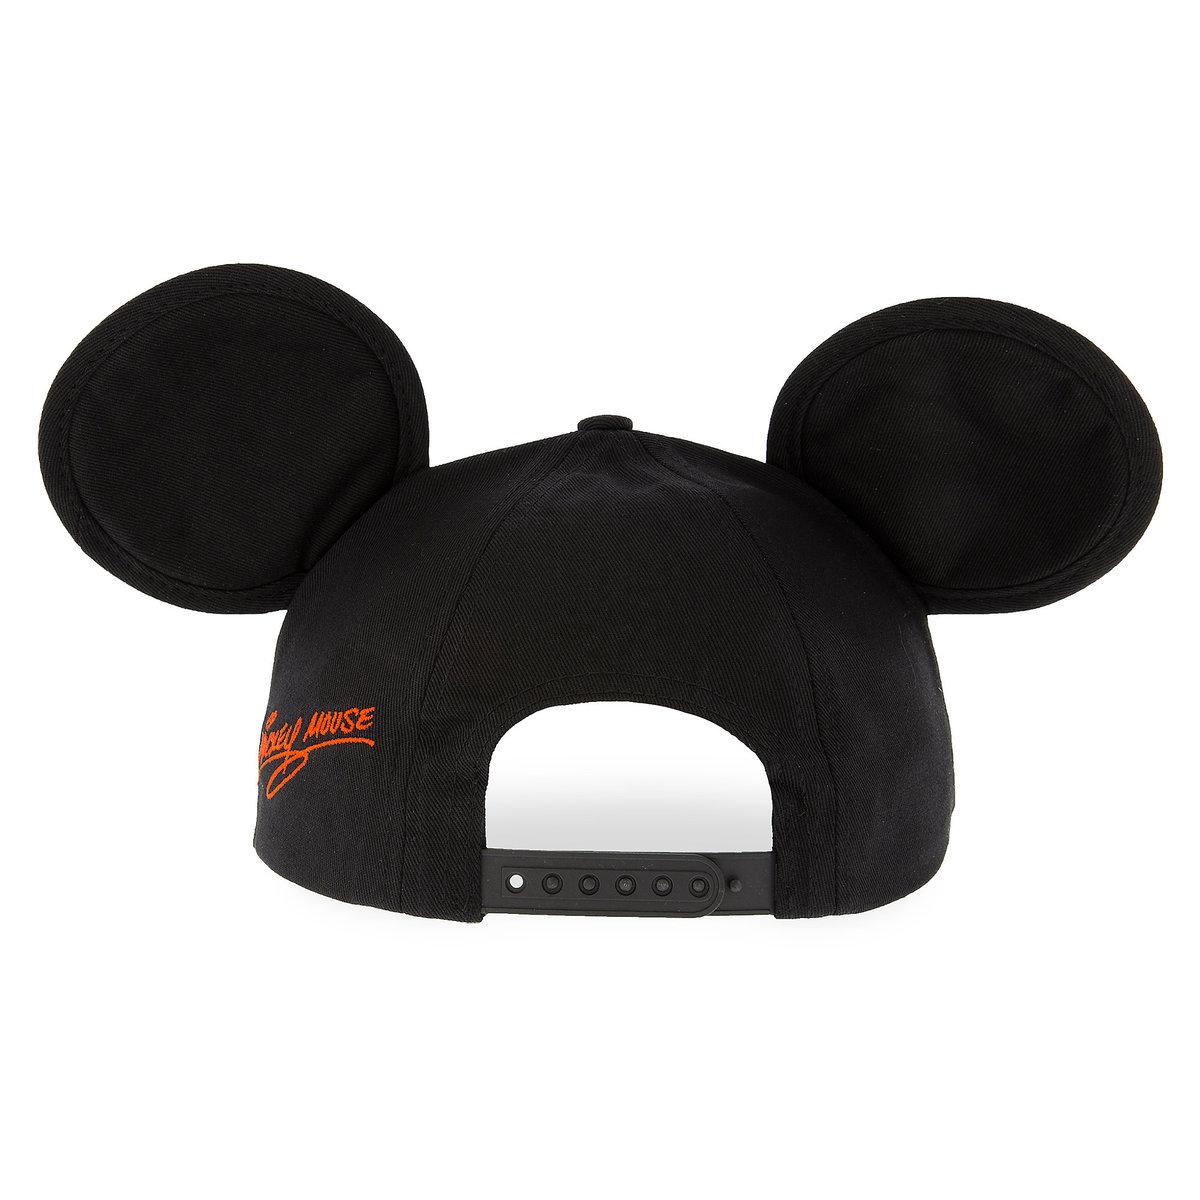 8af55fcd4b535 Disney Baseball Cap - Mickey Mouse Ears